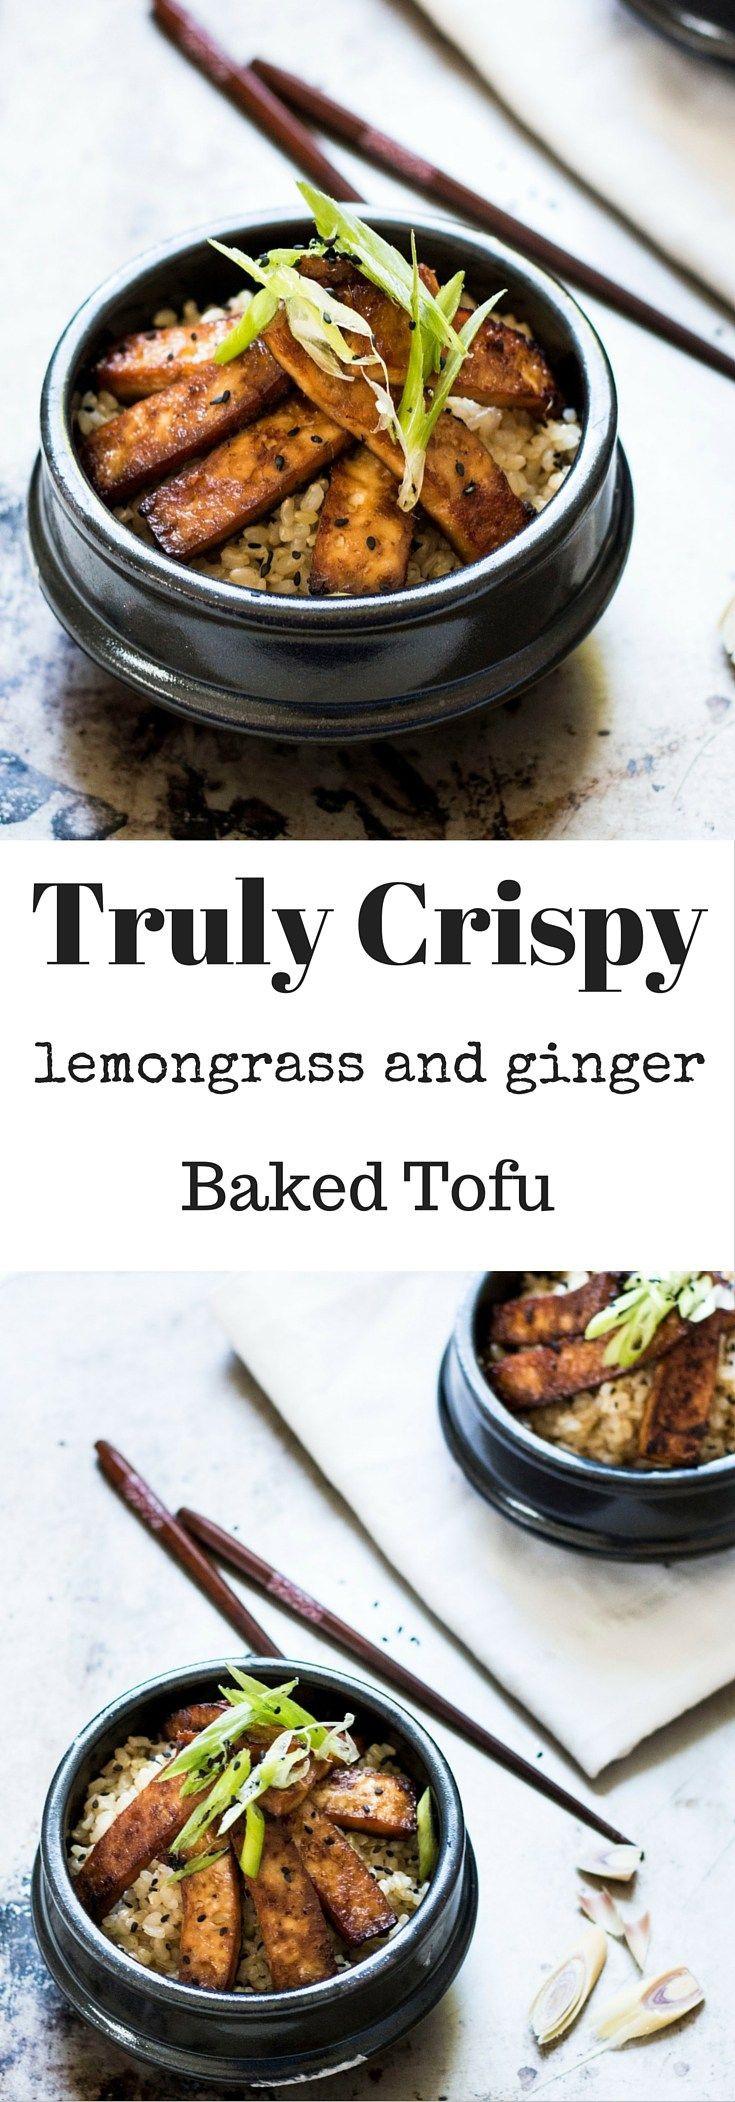 Healthy Baked Tofu Recipes  Truly Crispy Baked Lemongrass and Ginger Tofu